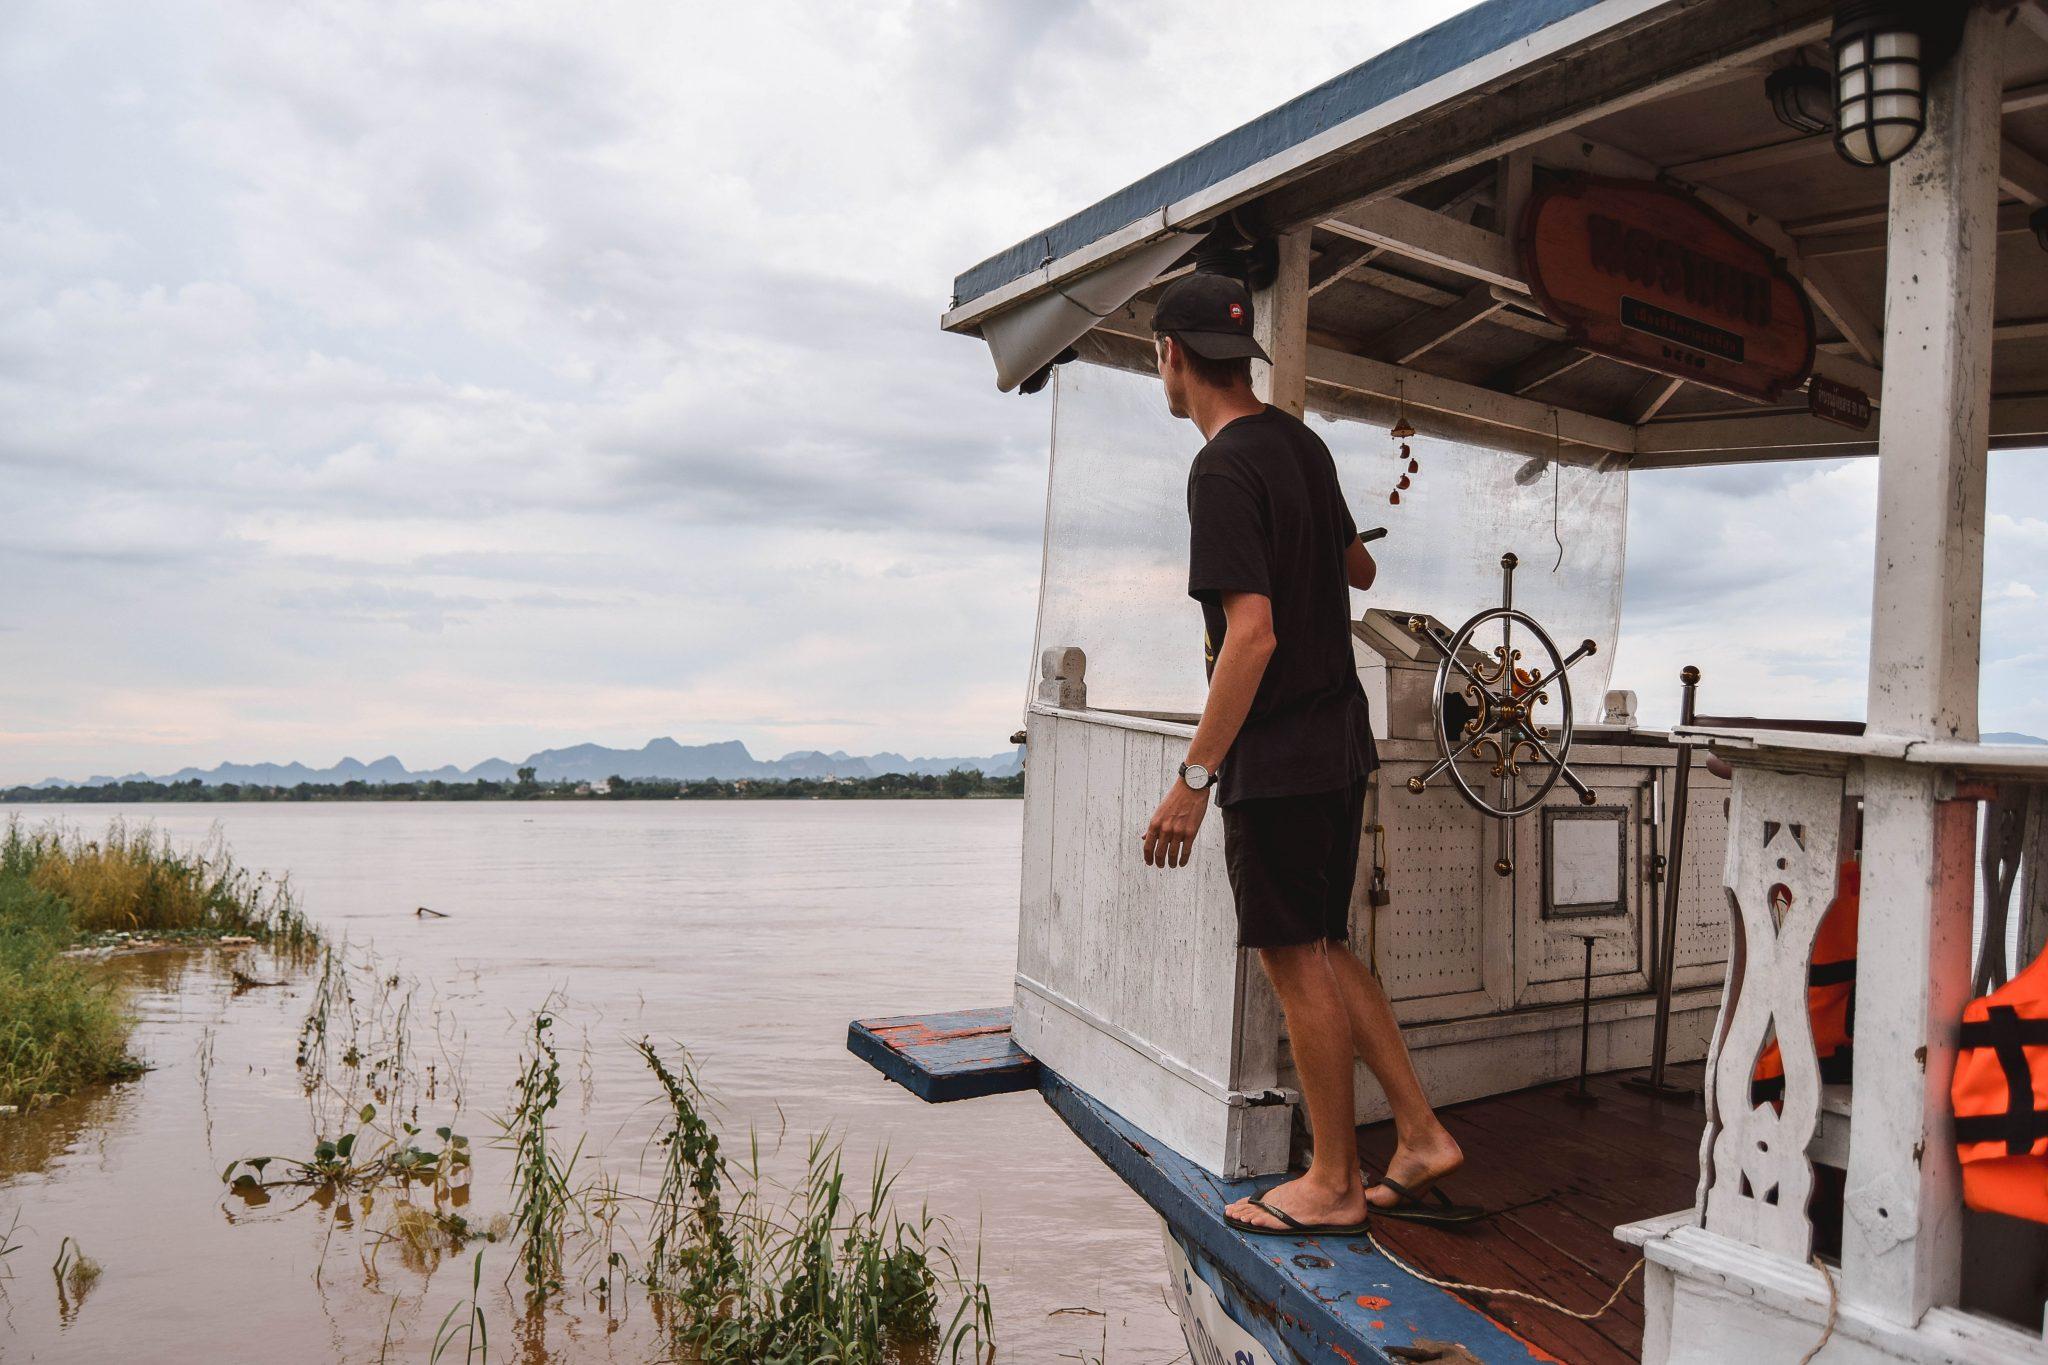 Wanderers & Warriors - Charlie & Lauren UK Travel Couple - 7 Things To Do In Nakhon Phanom - Mekong River Cruise Thailand